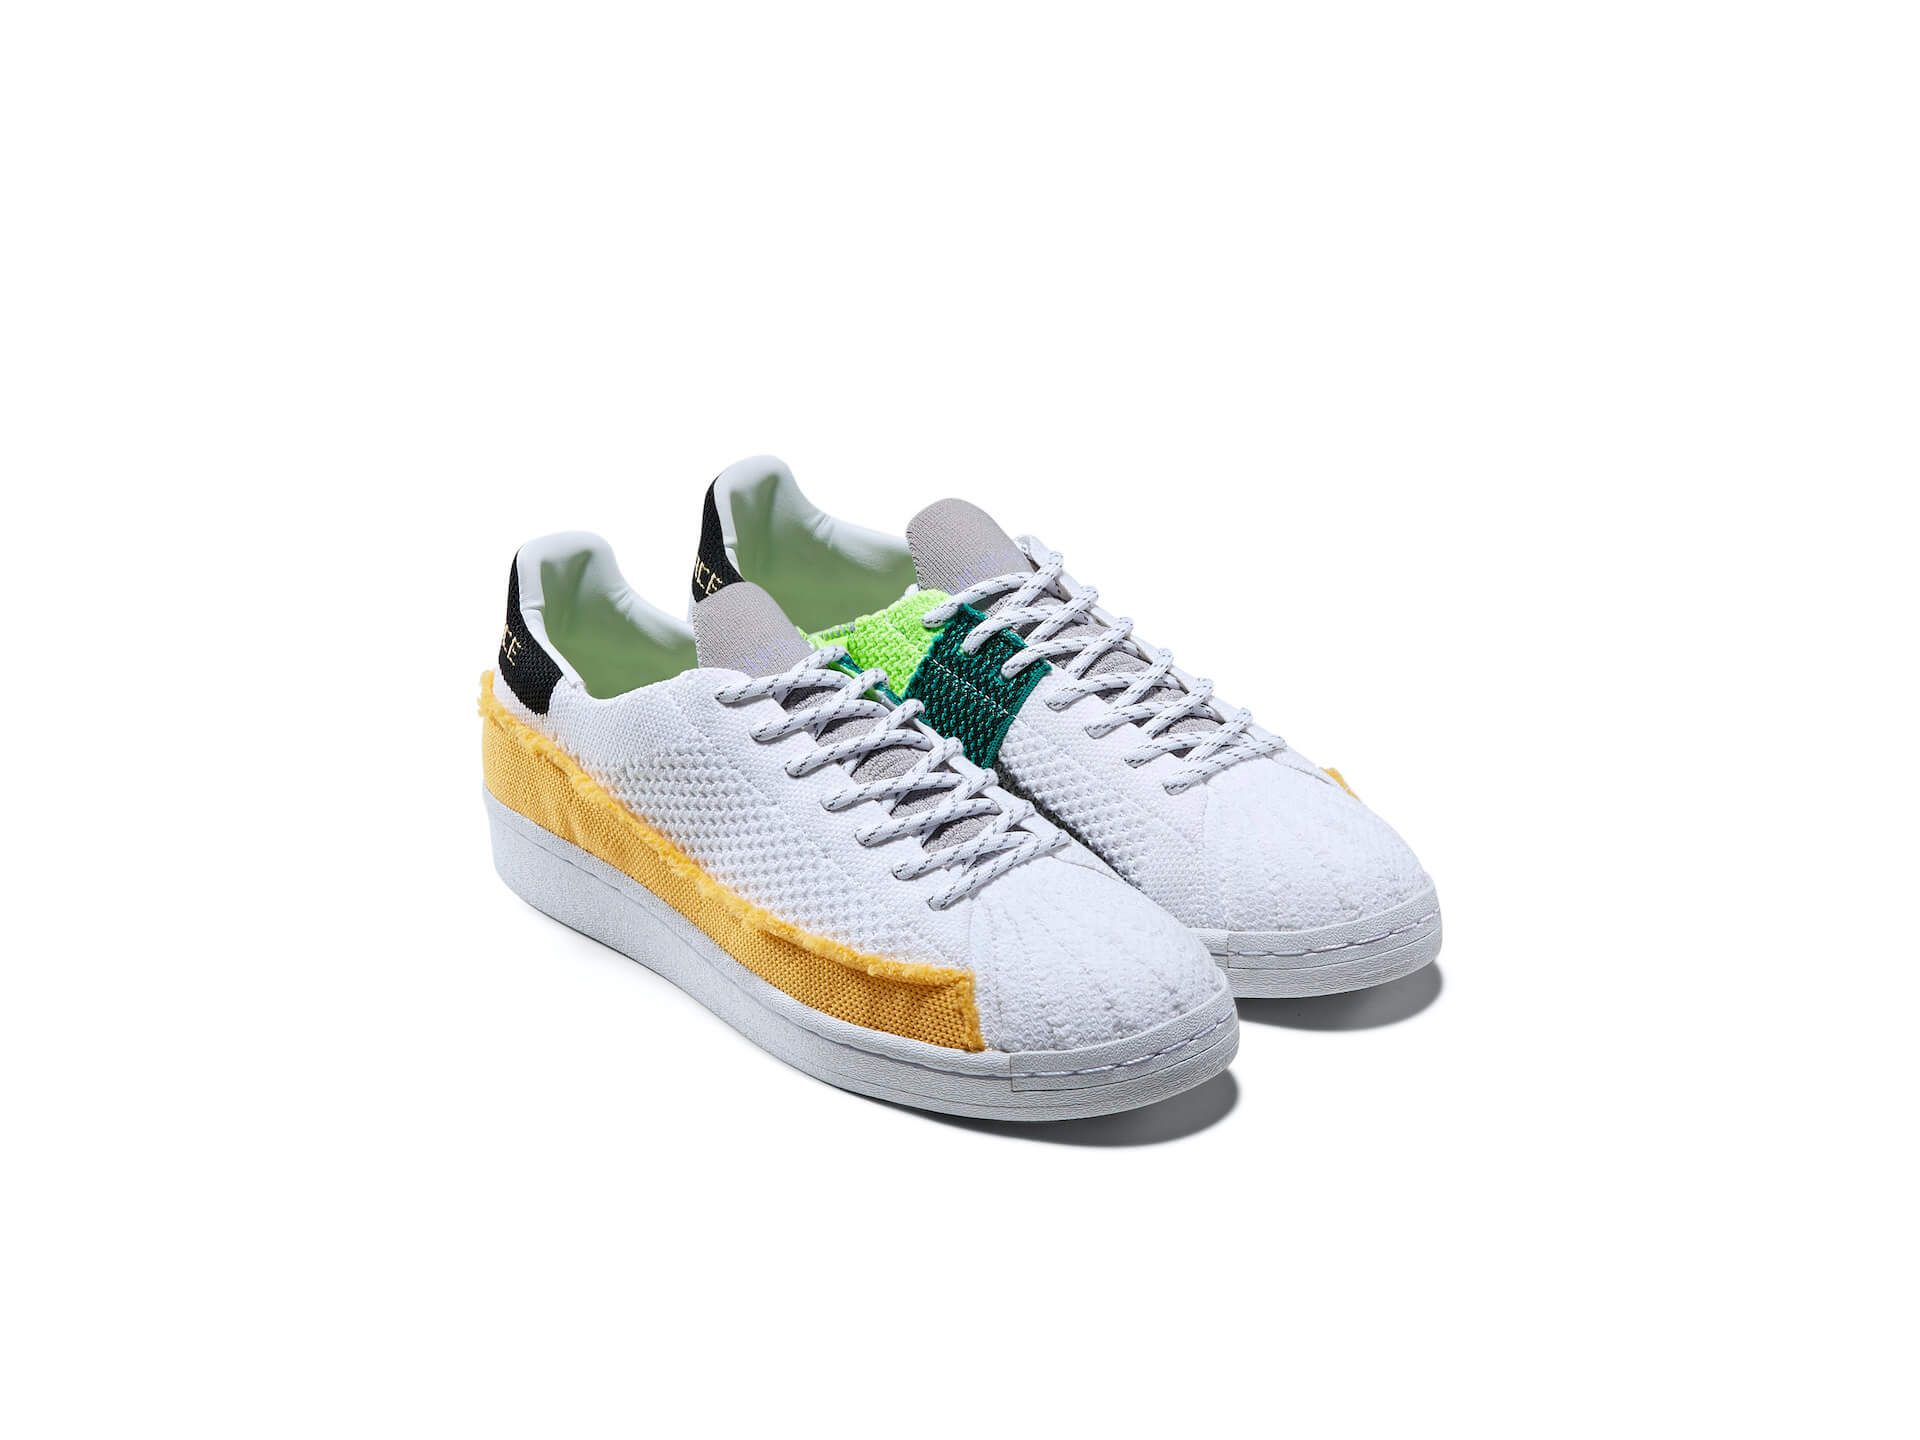 adidas Originalsとファレル・ウィリアムスのコラボ『SUPERSTAR』が登場!パッチワークパネルが目を引くデザイン lf200701_adidasporiginals_pharrelwilliams_01